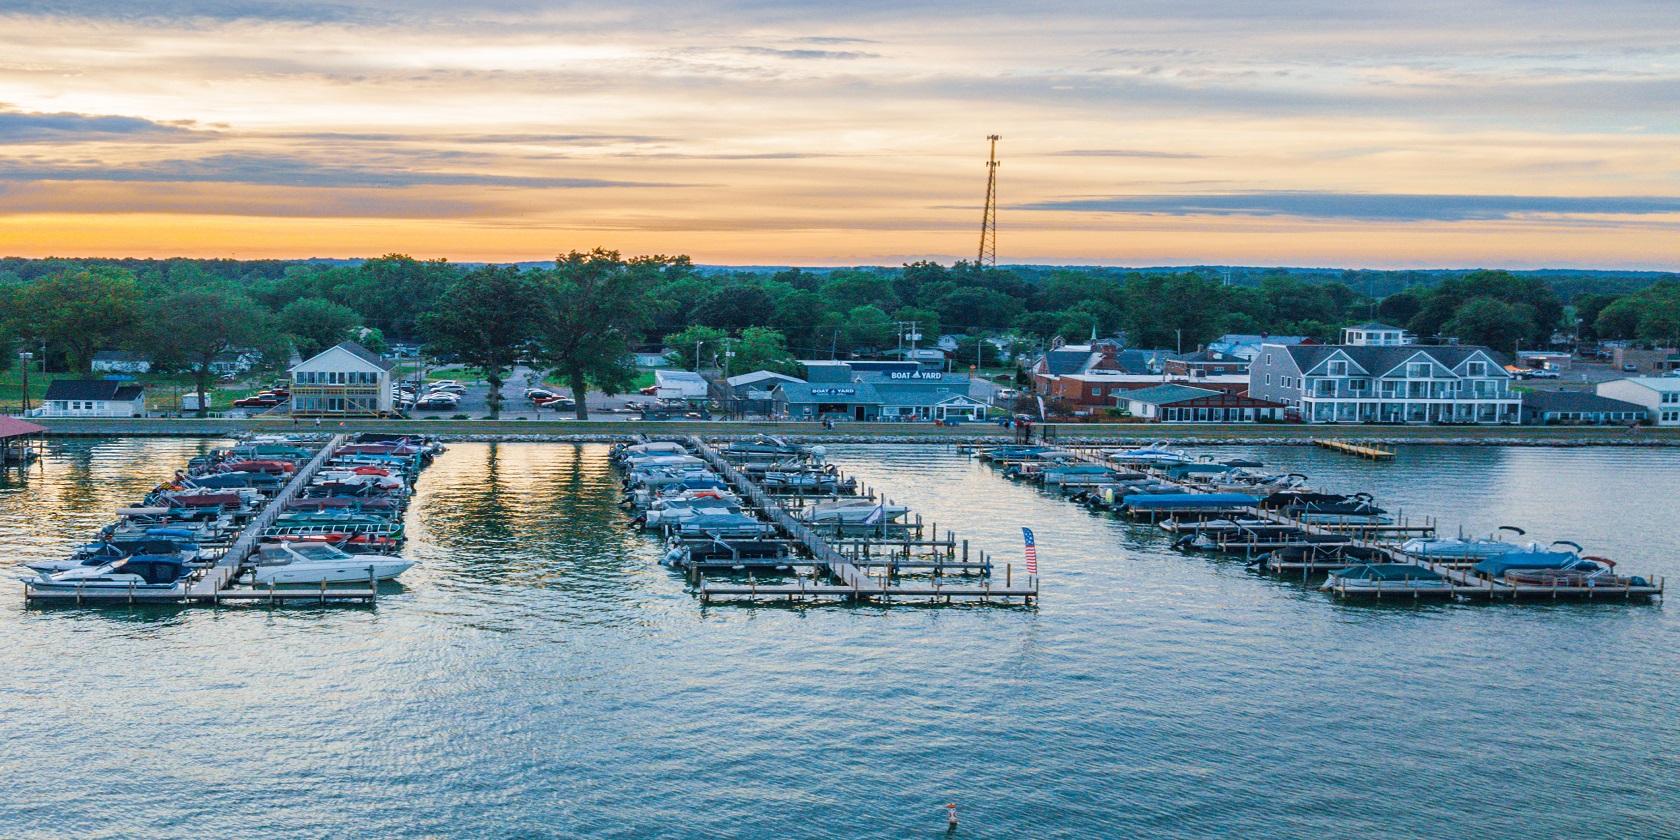 boat docks on the lake